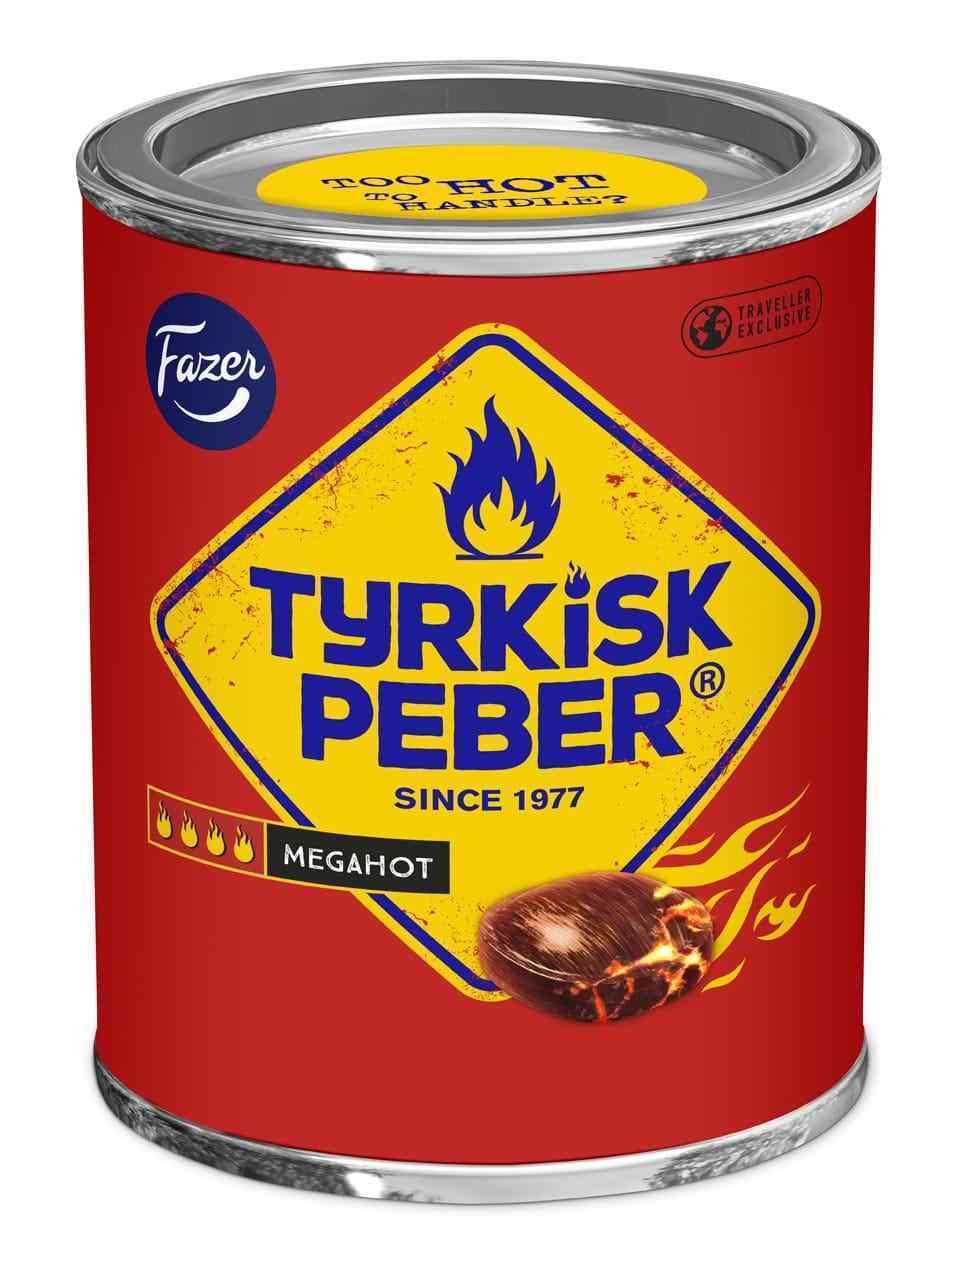 Tyrkisk Peber Megahot 300g tin (SET OF FIVE) FAZER Finland - $64.34